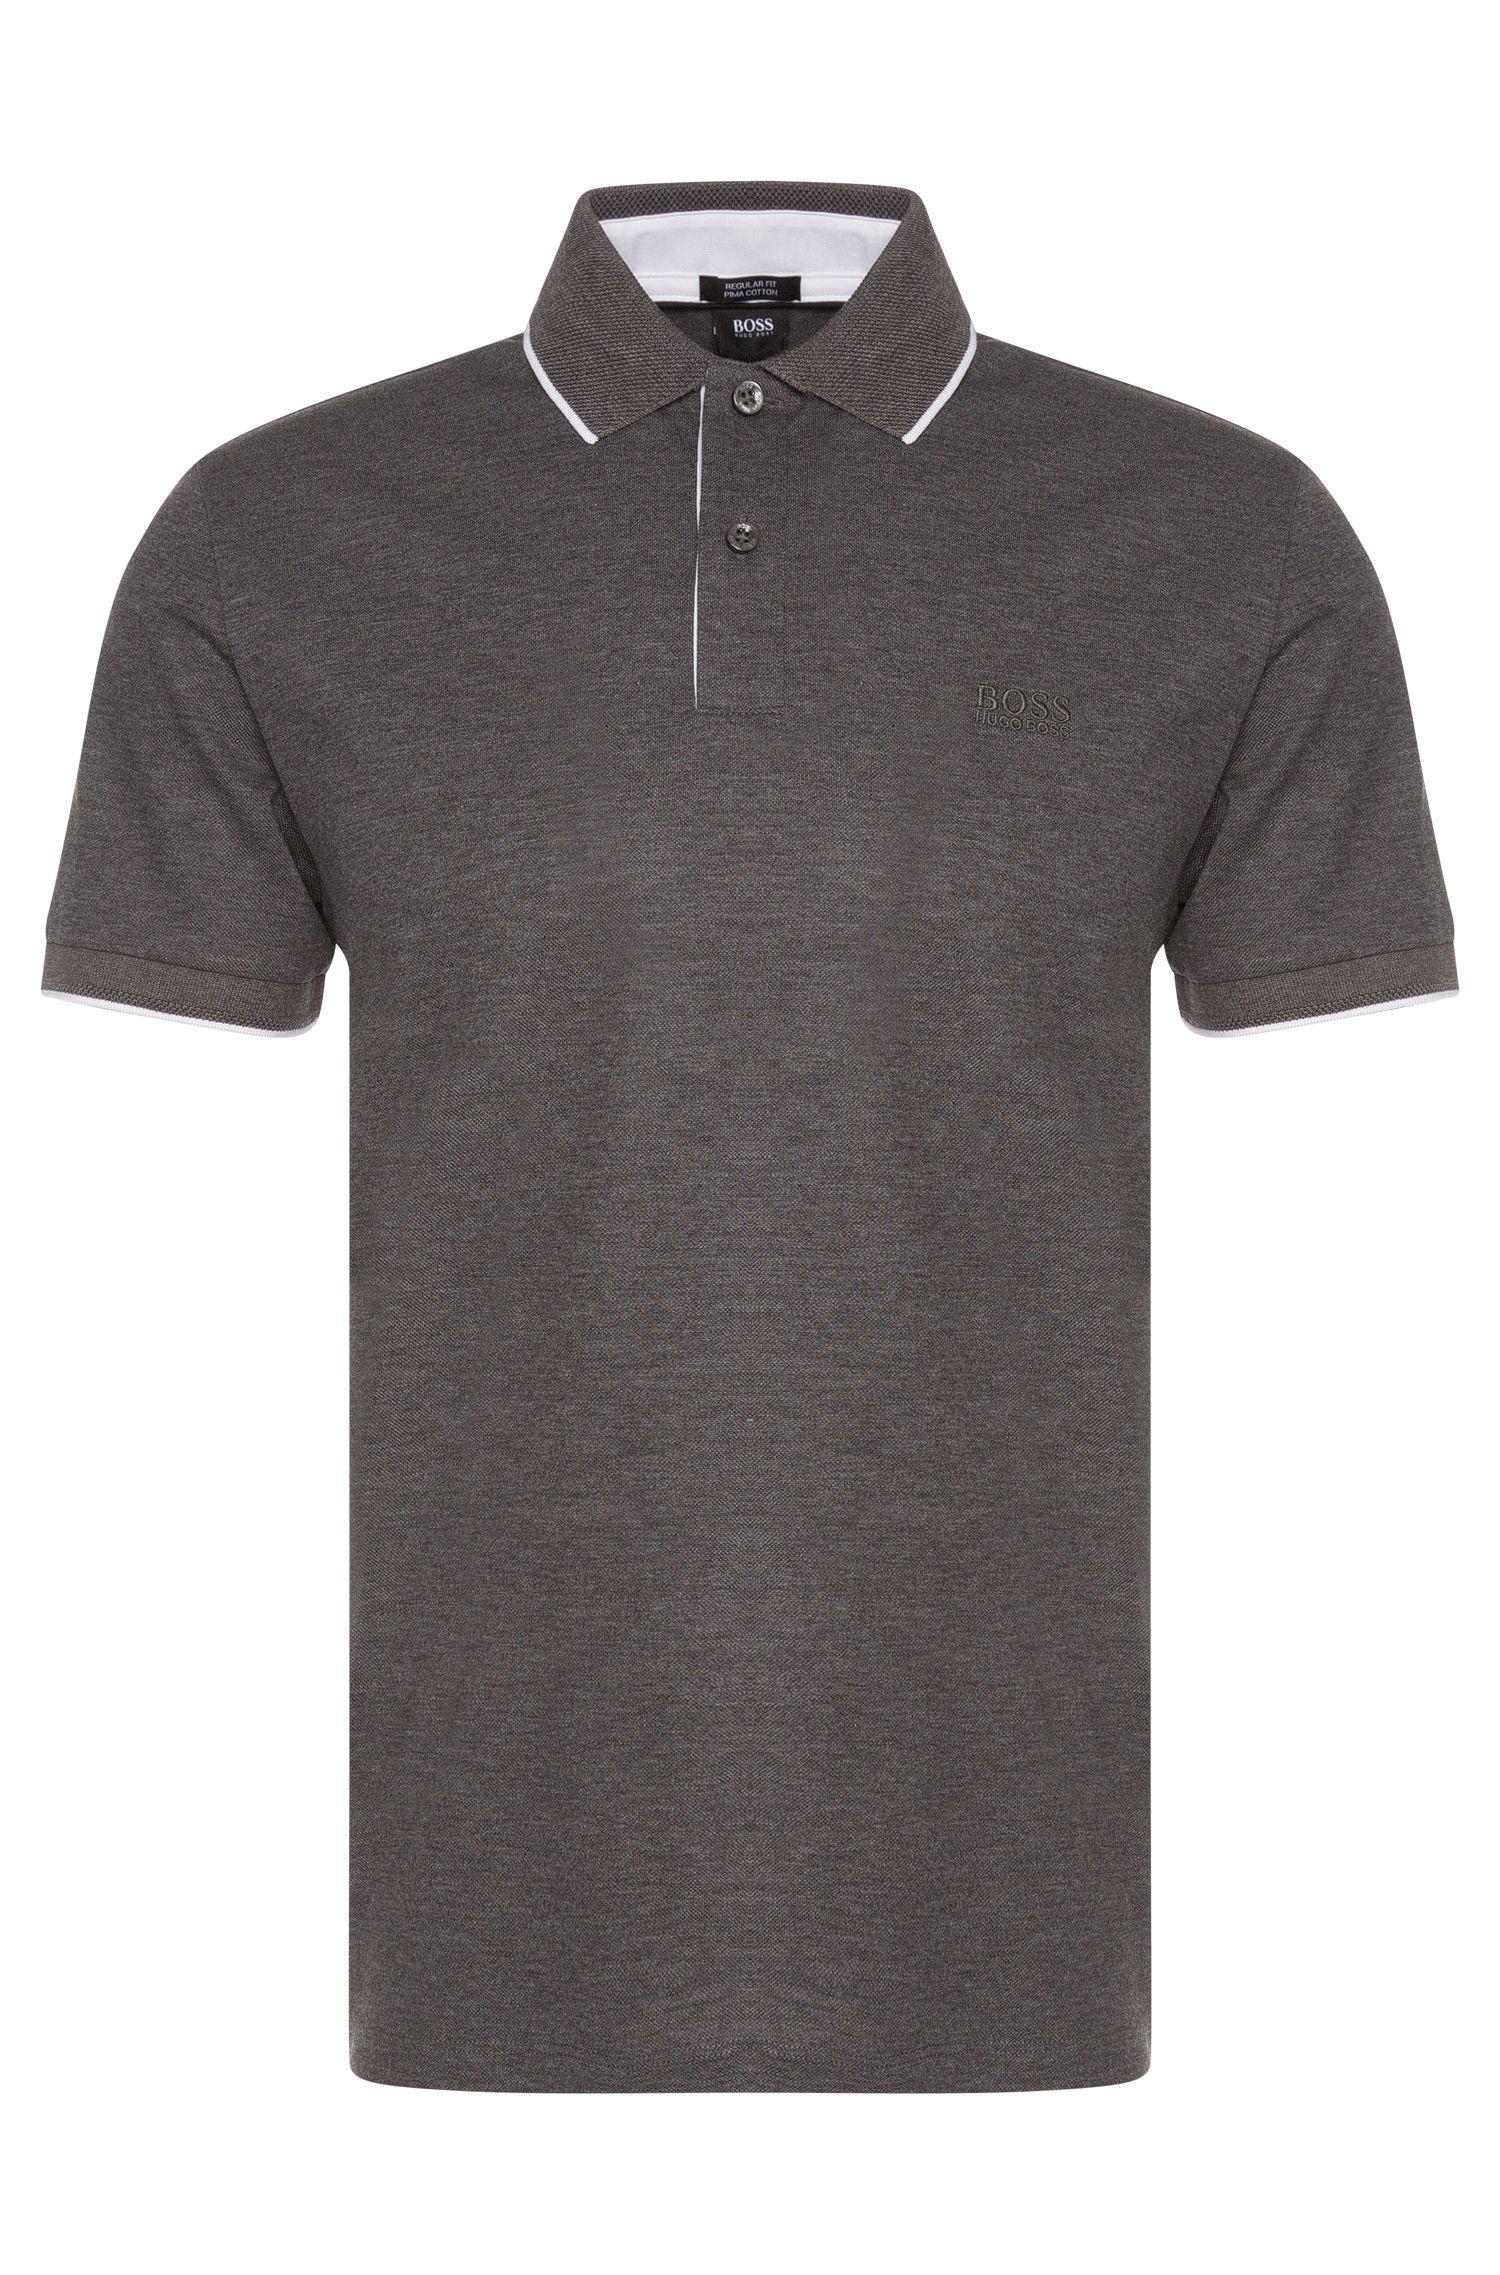 Regular-Fit Poloshirt aus Baumwolle: 'Parlay 03'